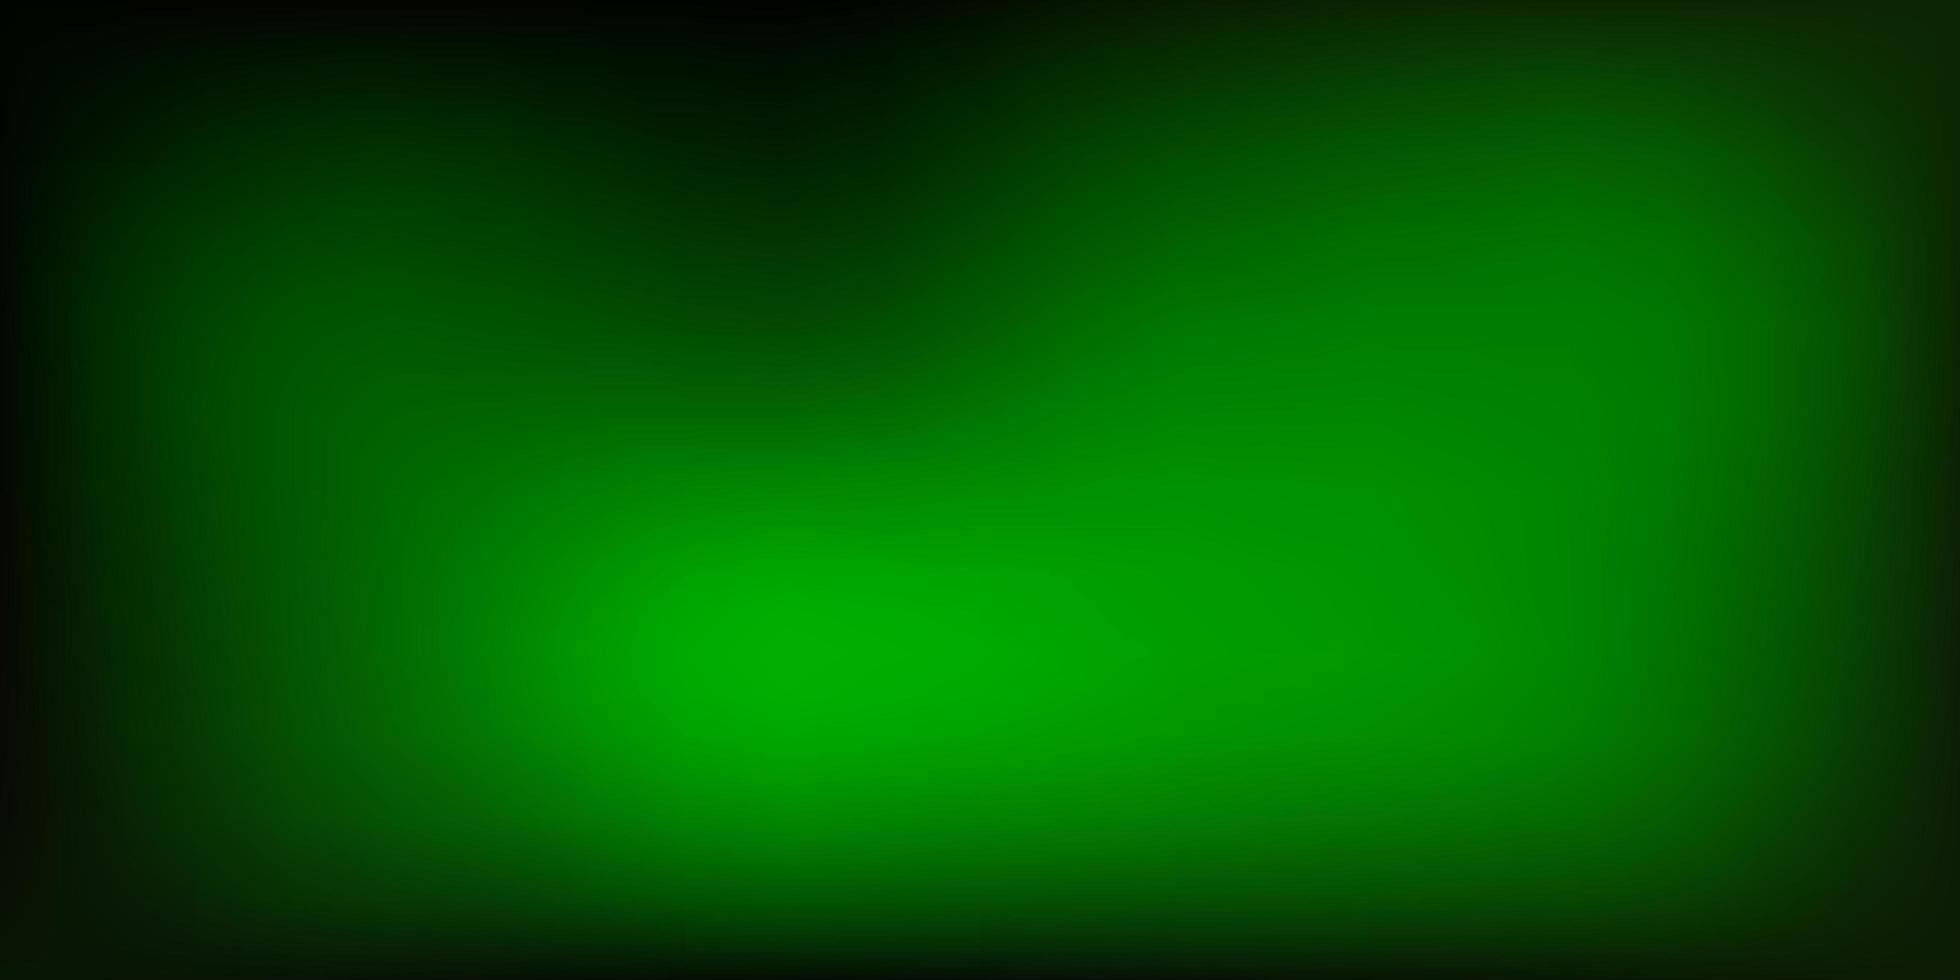 fundo borrado vetor verde escuro.